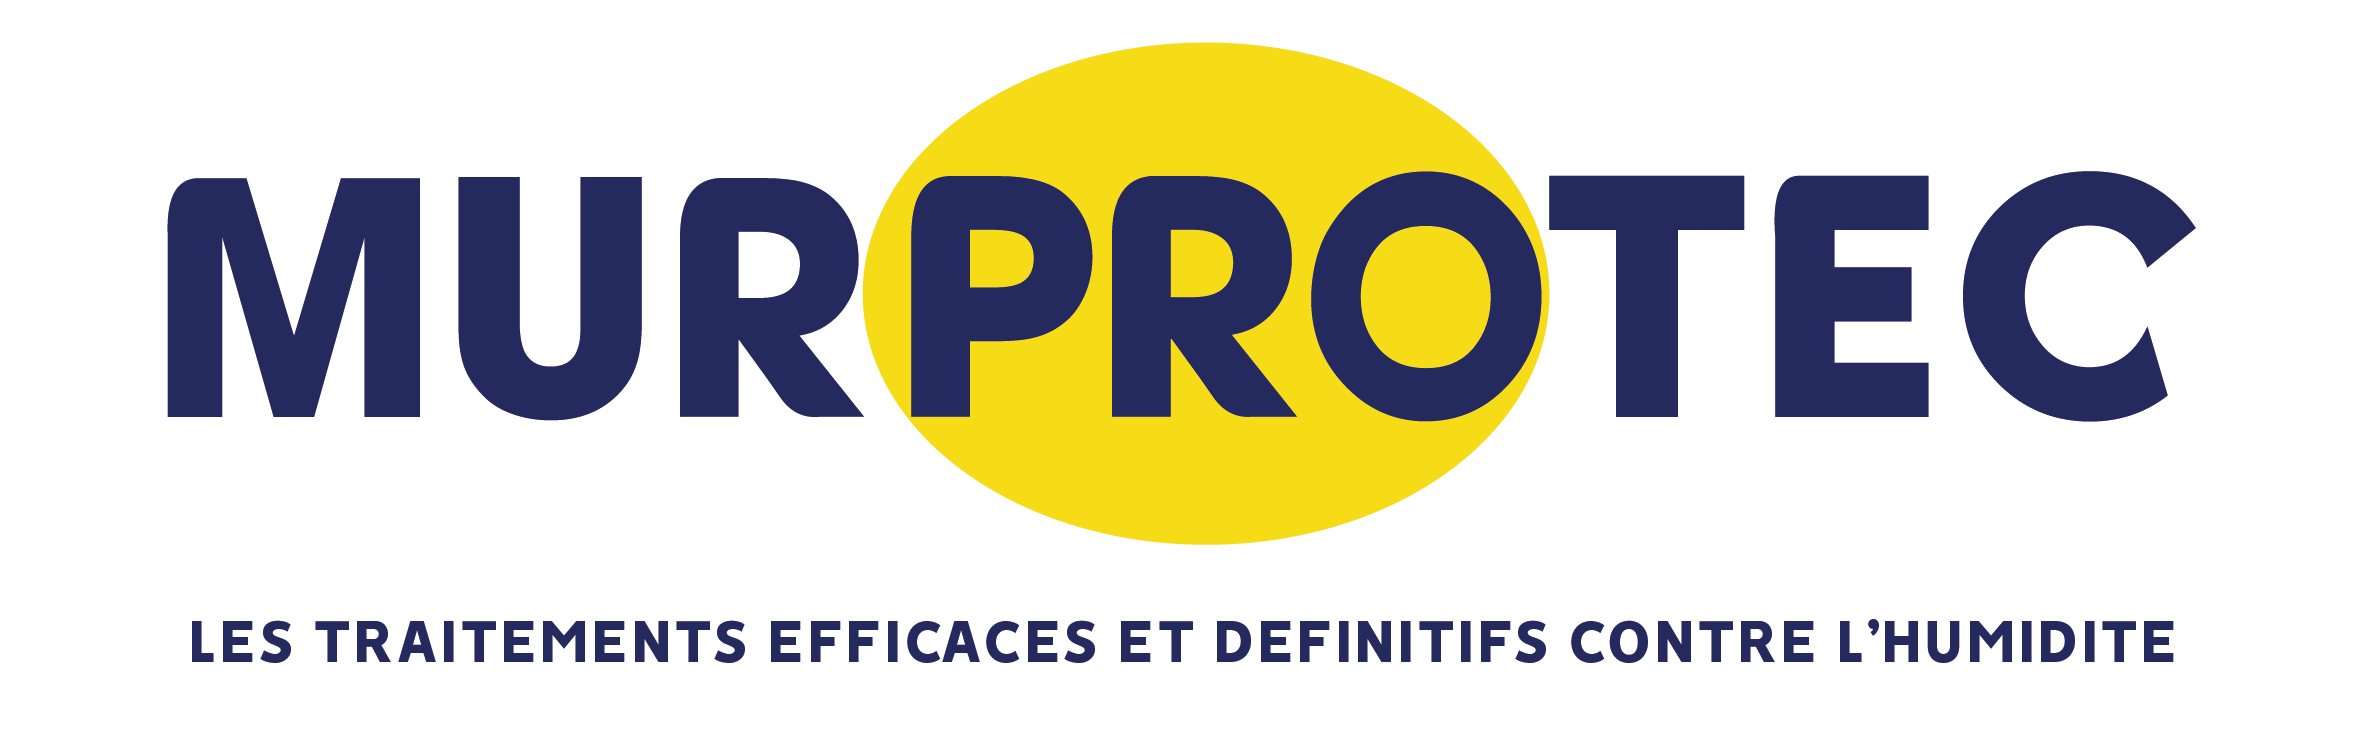 Murprotec logo